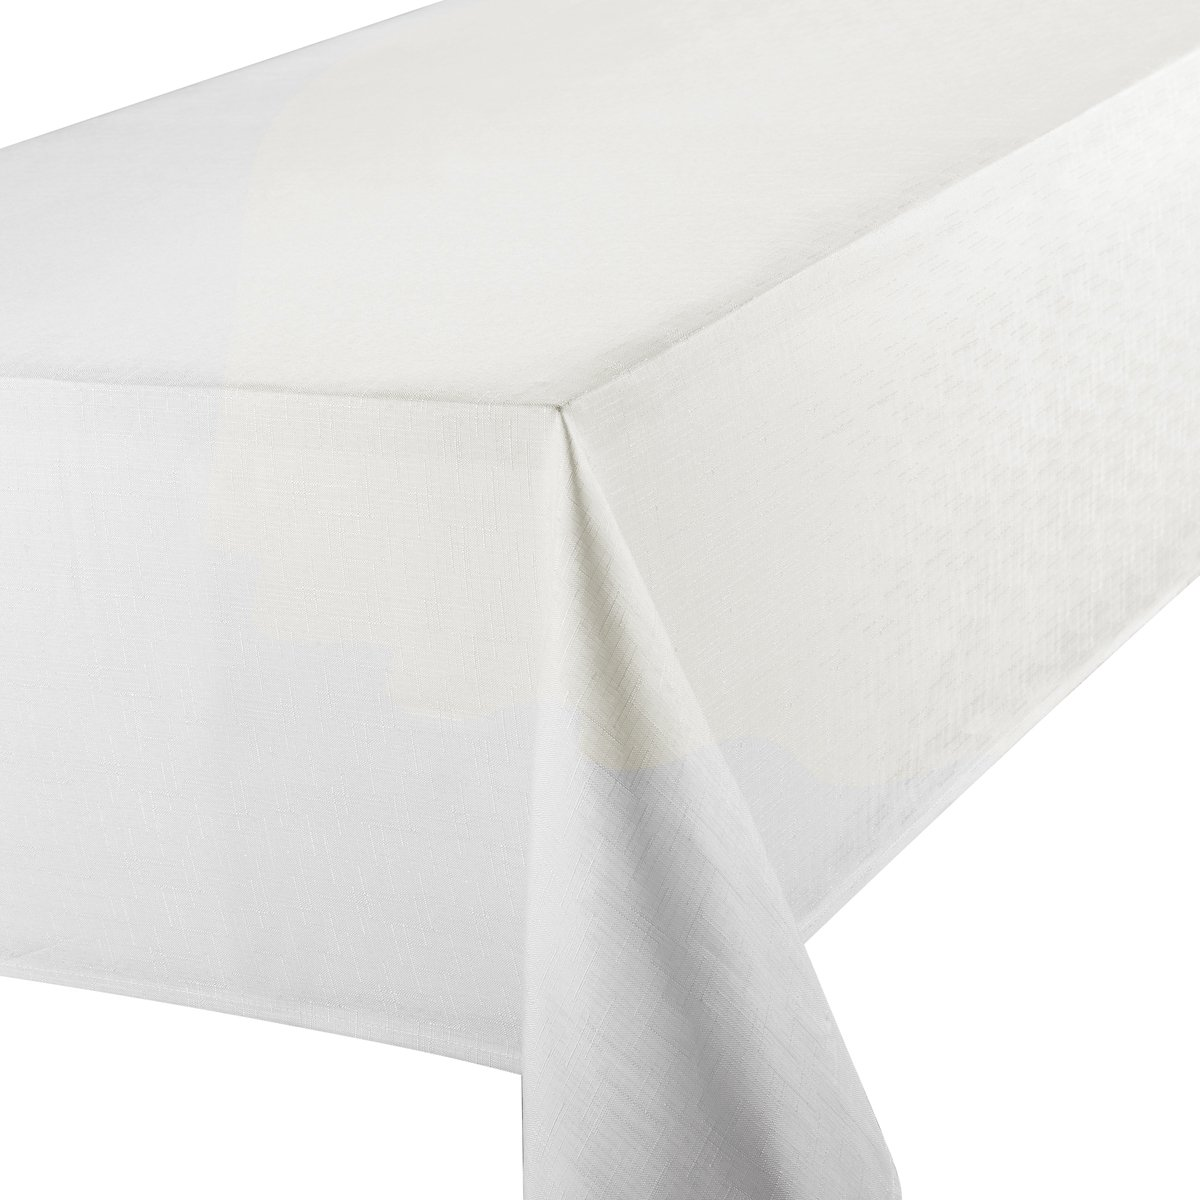 Premier 52 X 90 Inch Linen Look Oblong Tablecloth, White: Amazon.co.uk:  Kitchen U0026 Home